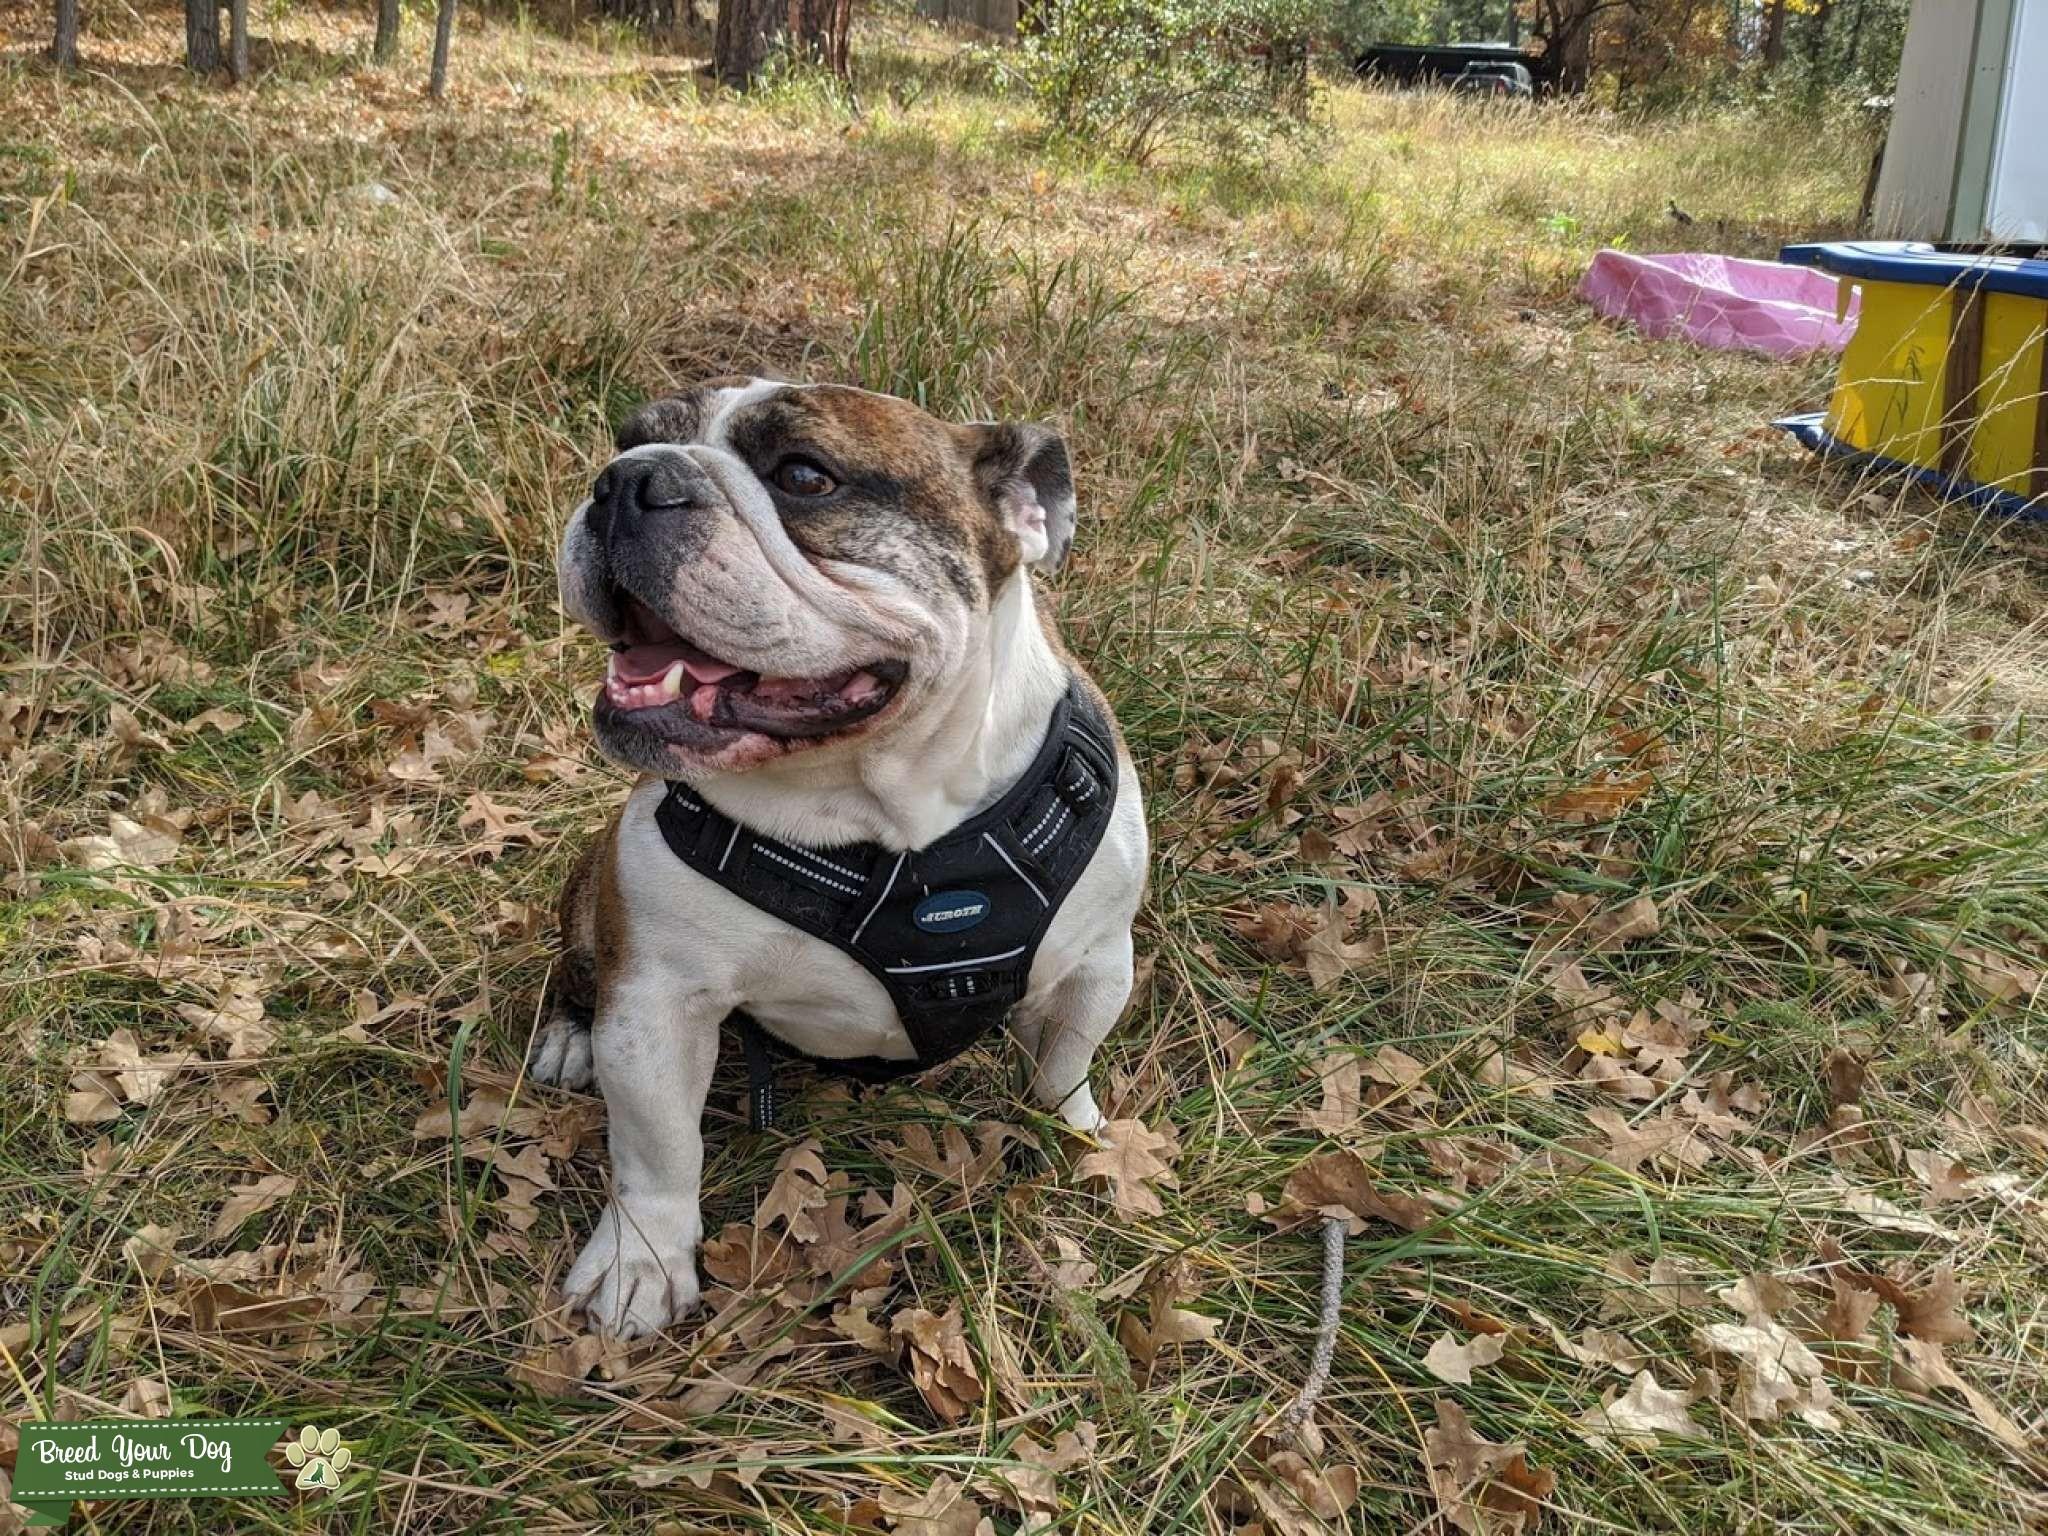 Ch and GCH Blood line English Bulldog Listing Image Big